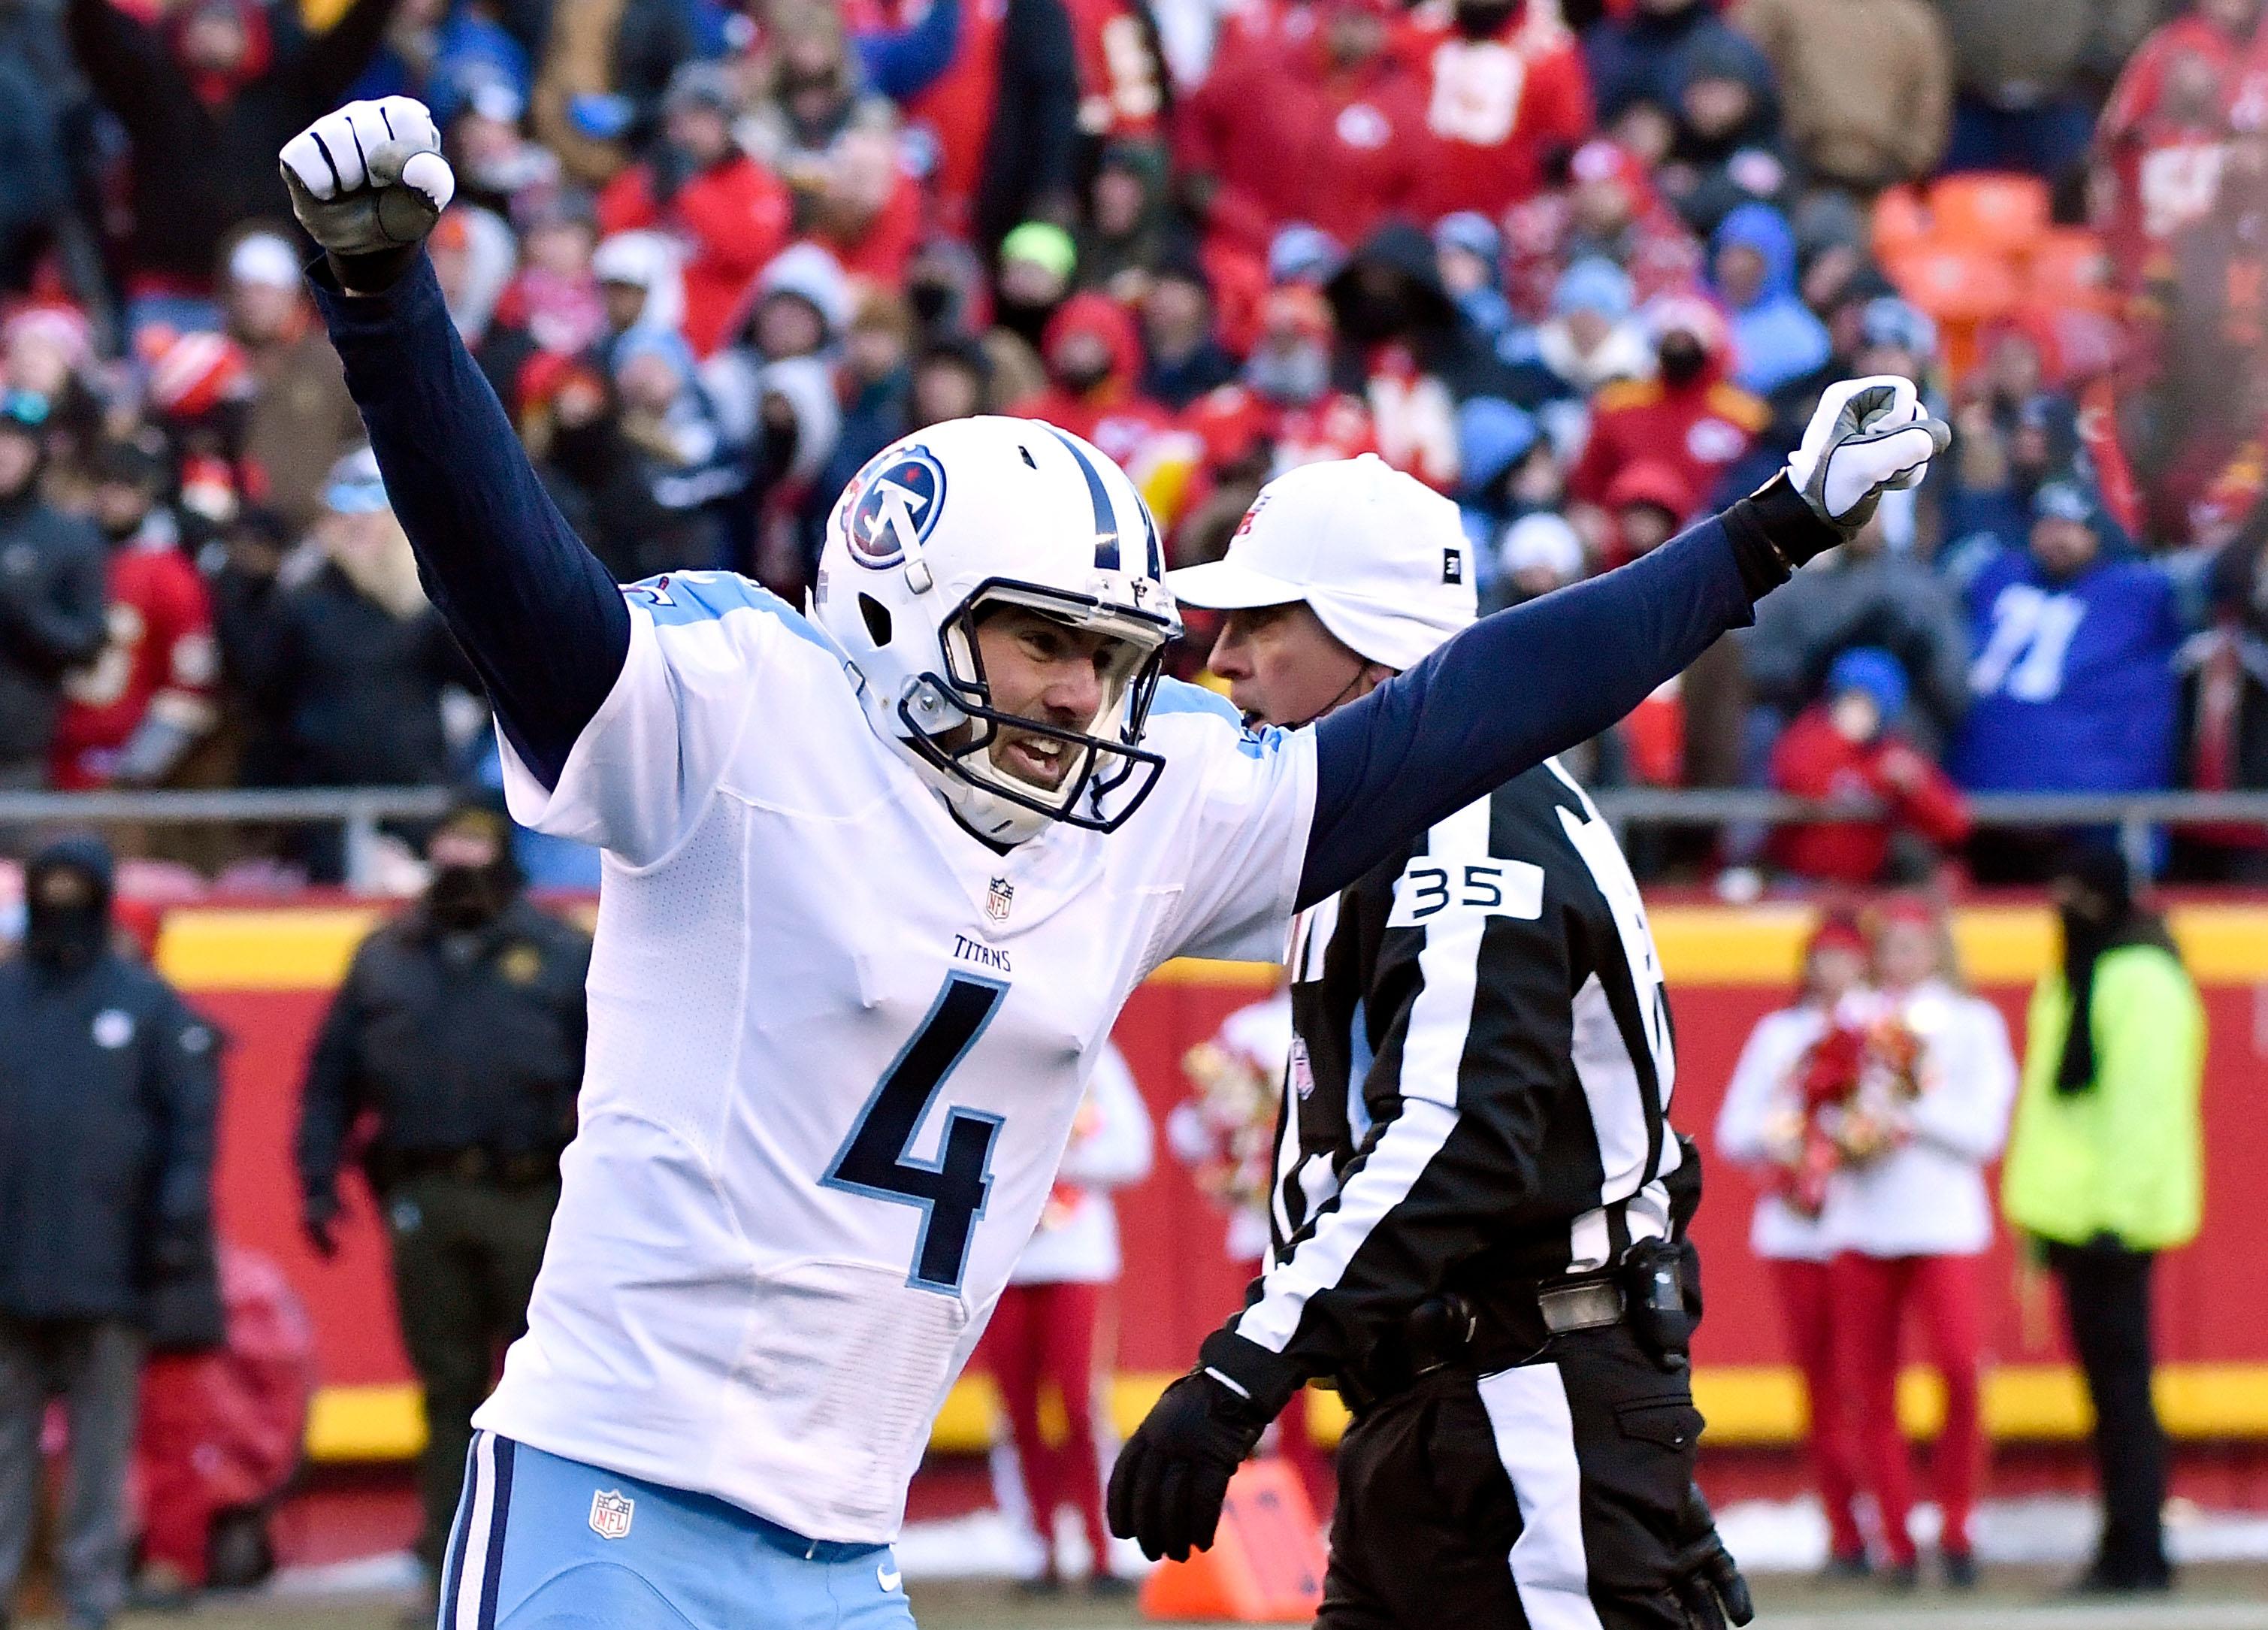 [NFL] Week 15: La vendetta dell'ex (Tennessee Titans vs Kansas City Chiefs 19-17)